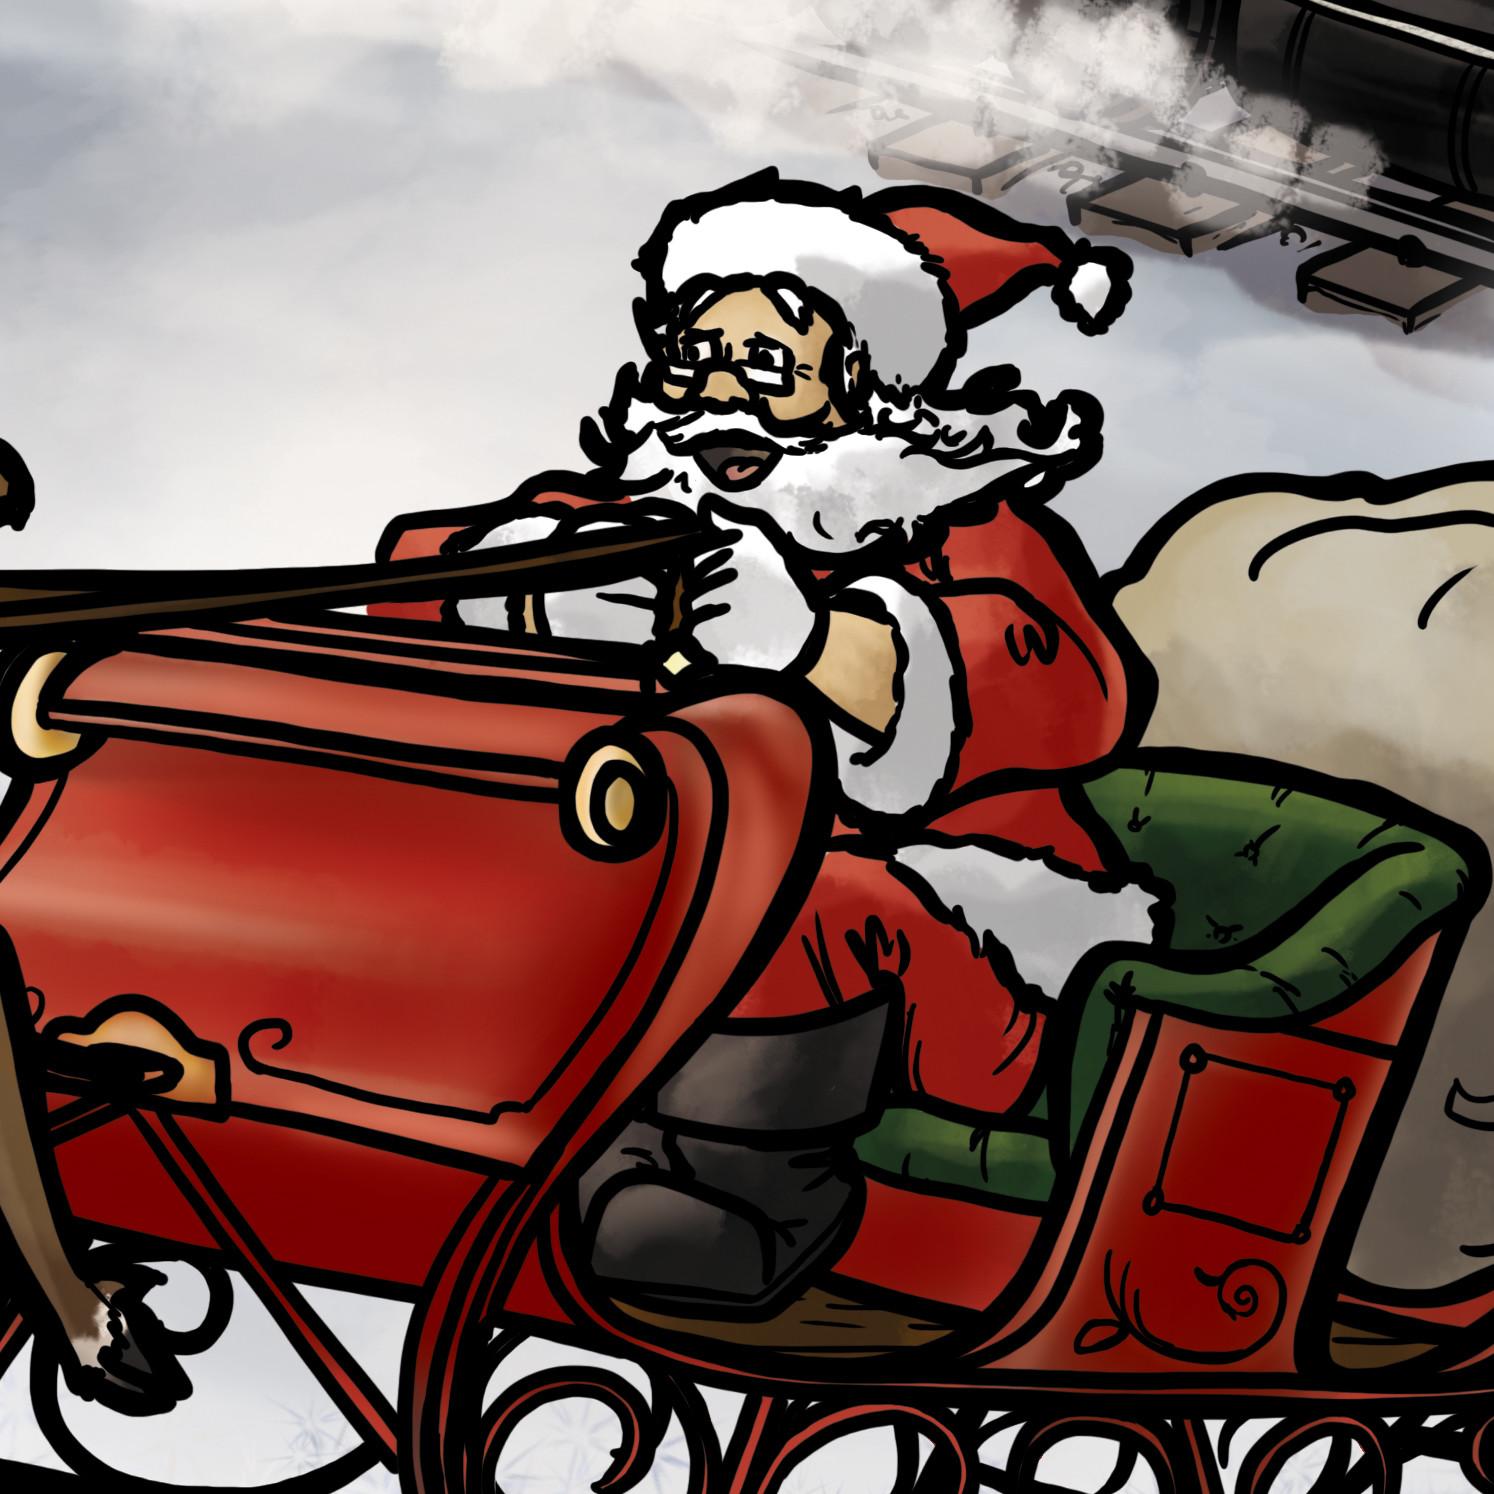 Graham moogk soulis wcr christmas book cover 2015 santa